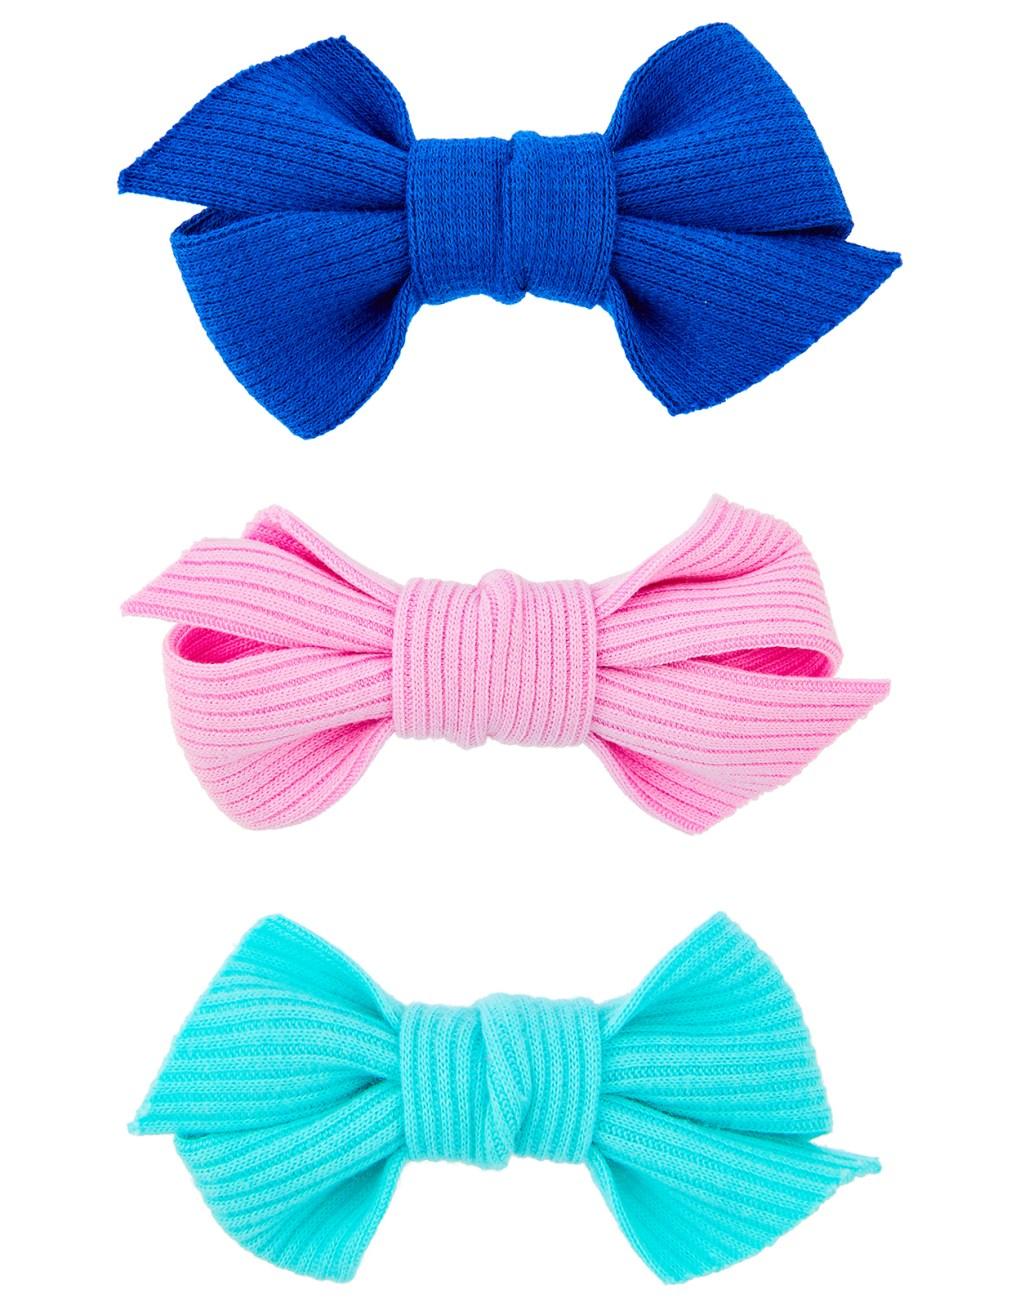 Accessorize soft bow clips